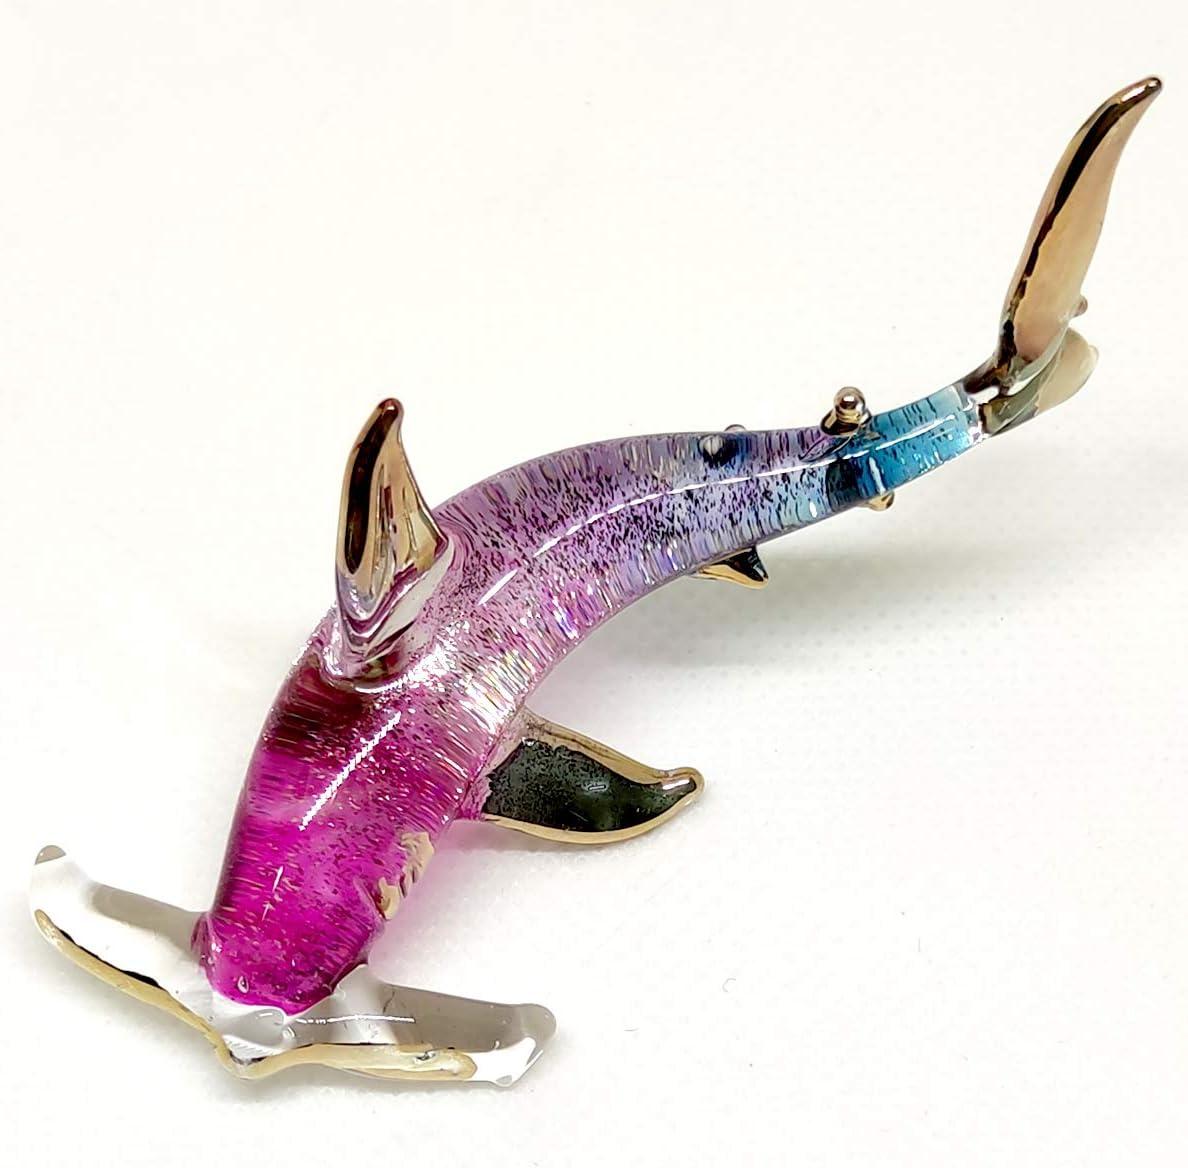 sansukjai Hammer Shark Miniature Figurines Sea Animals Hand Painted Blown Glass Art Gold Trim Collectible Gift Decorate, Red Blue Glitter